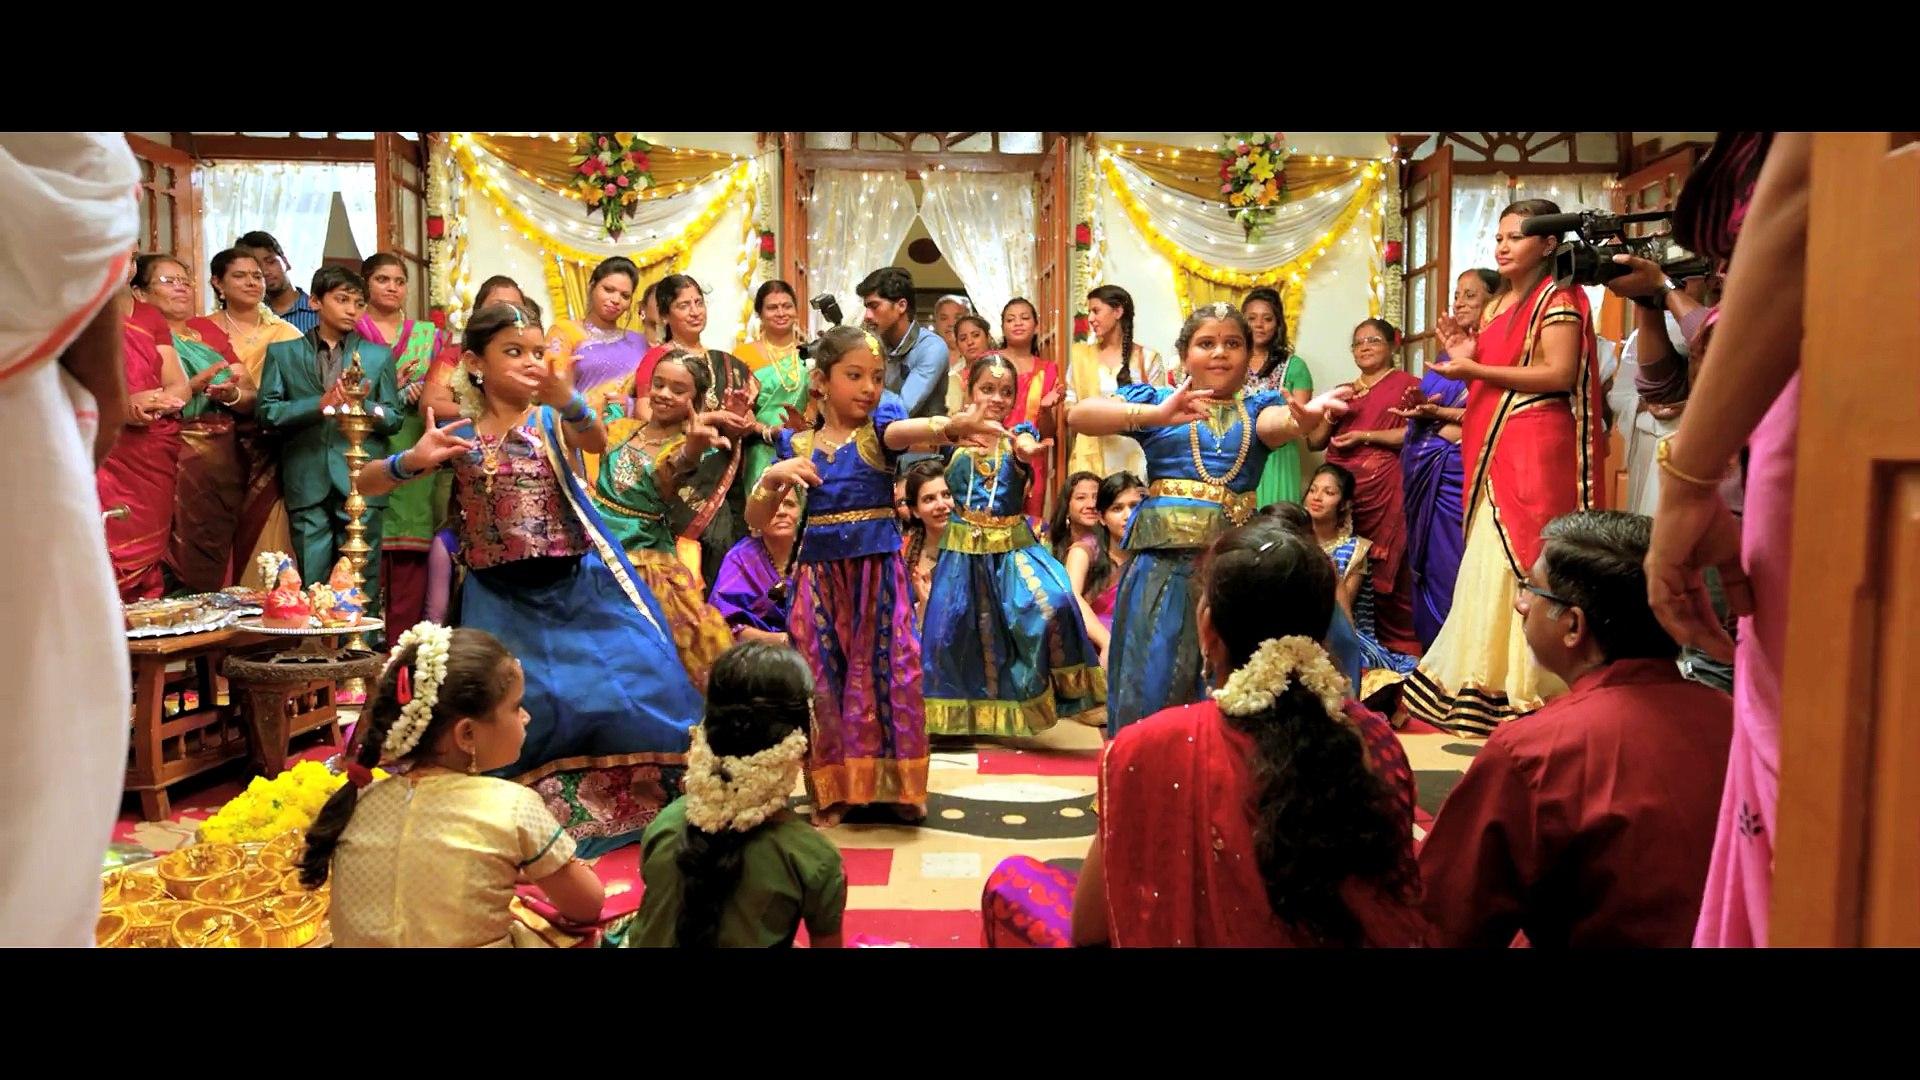 Police (2016) Telugu Movie Official Theatrical Trailer[HD] - Vijay,  Samantha Ruth Prabhu, Amy Jackson | Vijay's Police Trailer